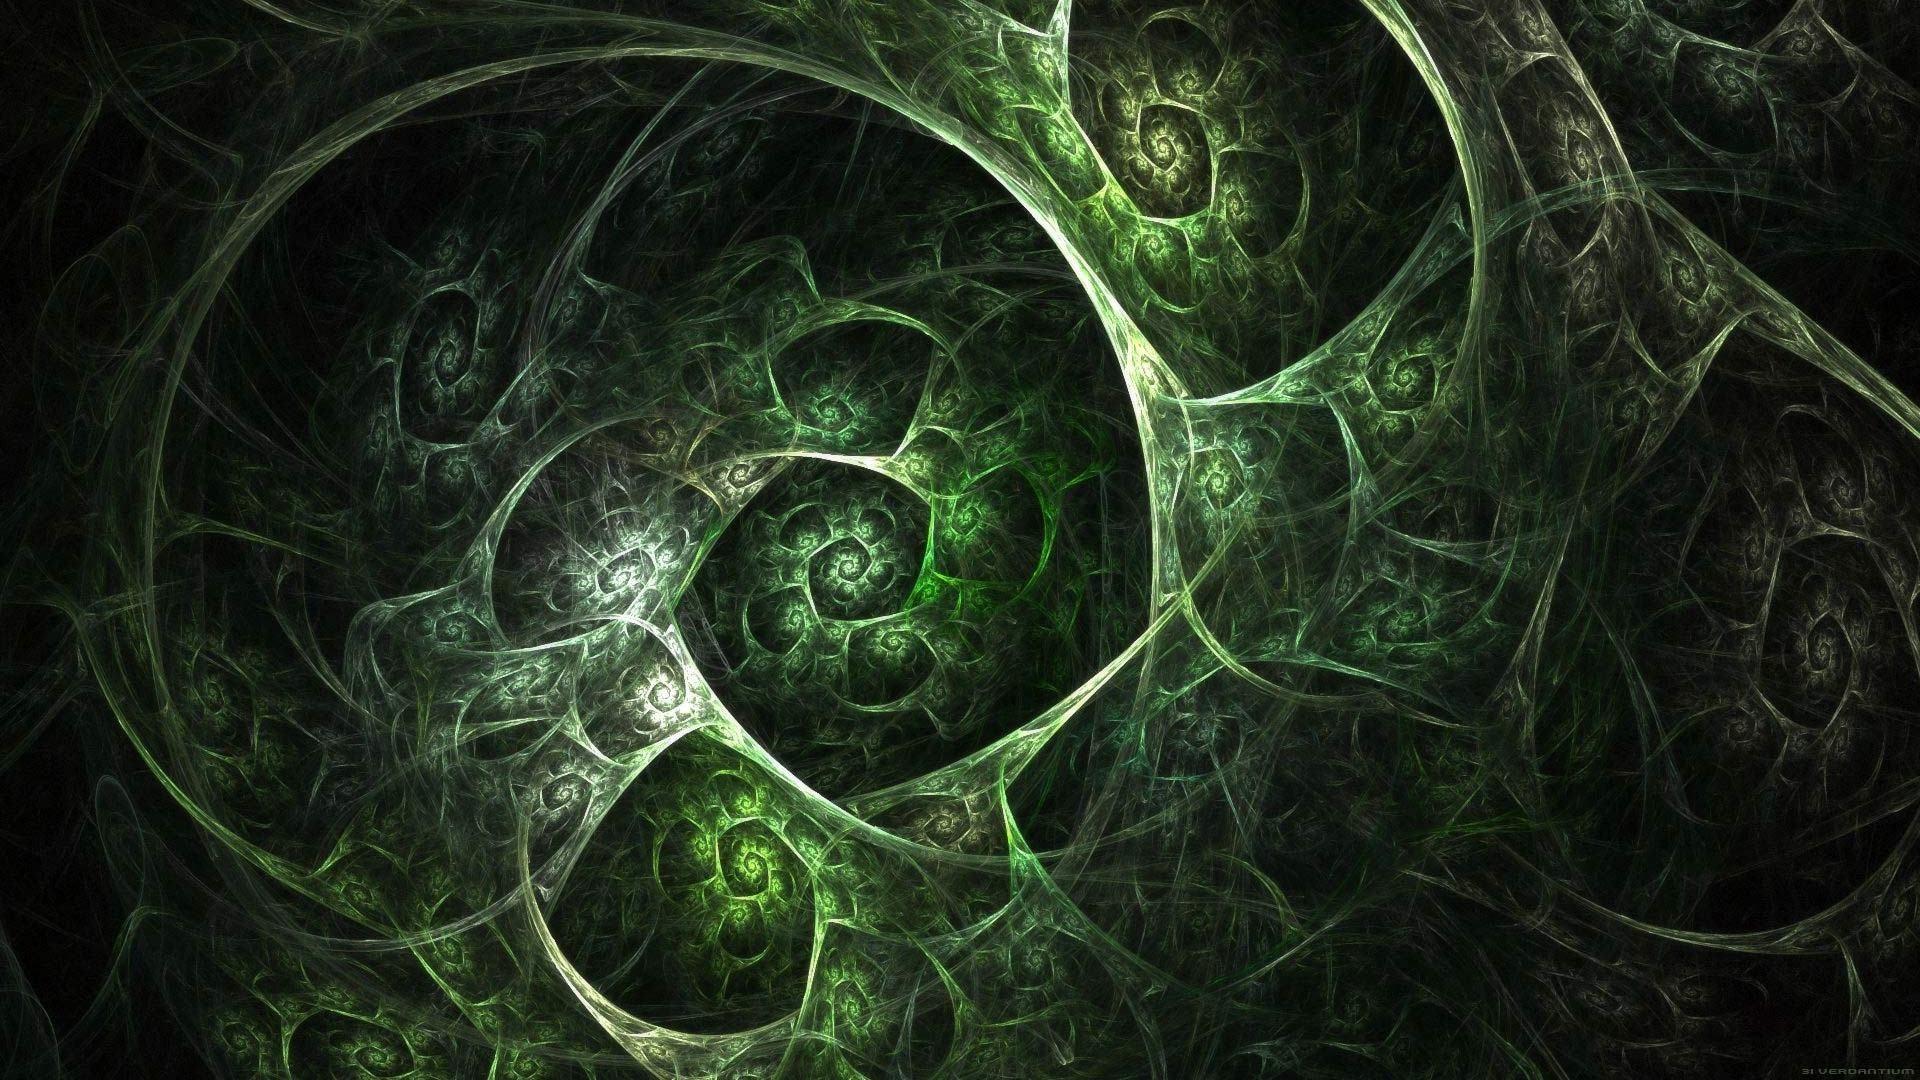 1280×819 Beautiful dragon. desktop wallpaper for fractal by Osborn Brian  (2017-03-06)